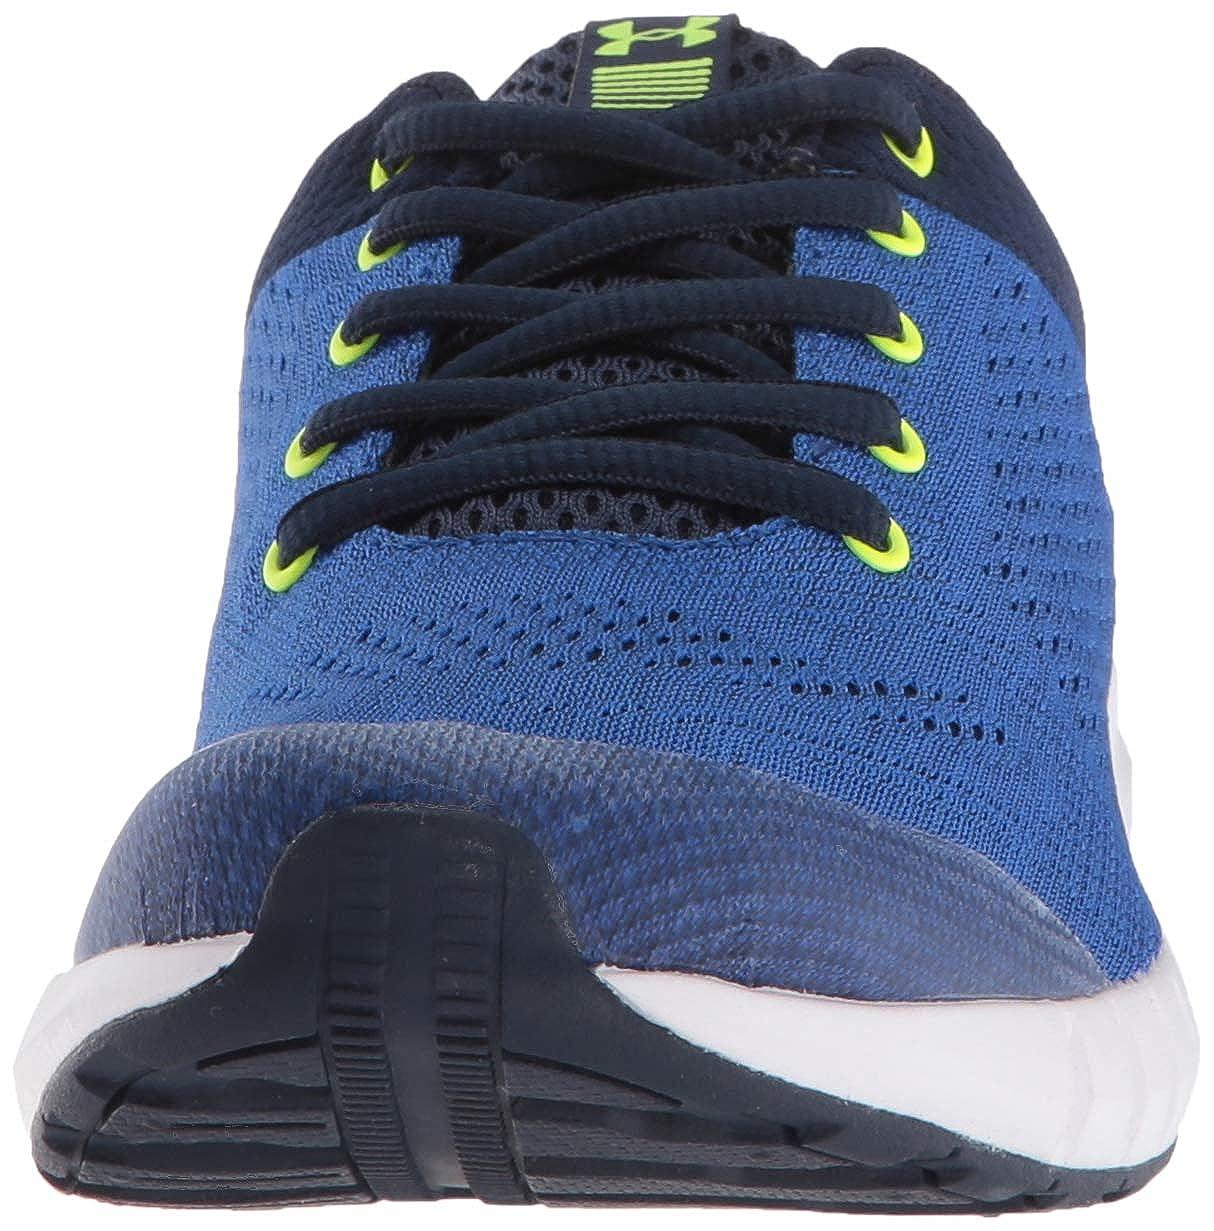 Under Armour Boys Pre School Pursuit Sneaker 3020771